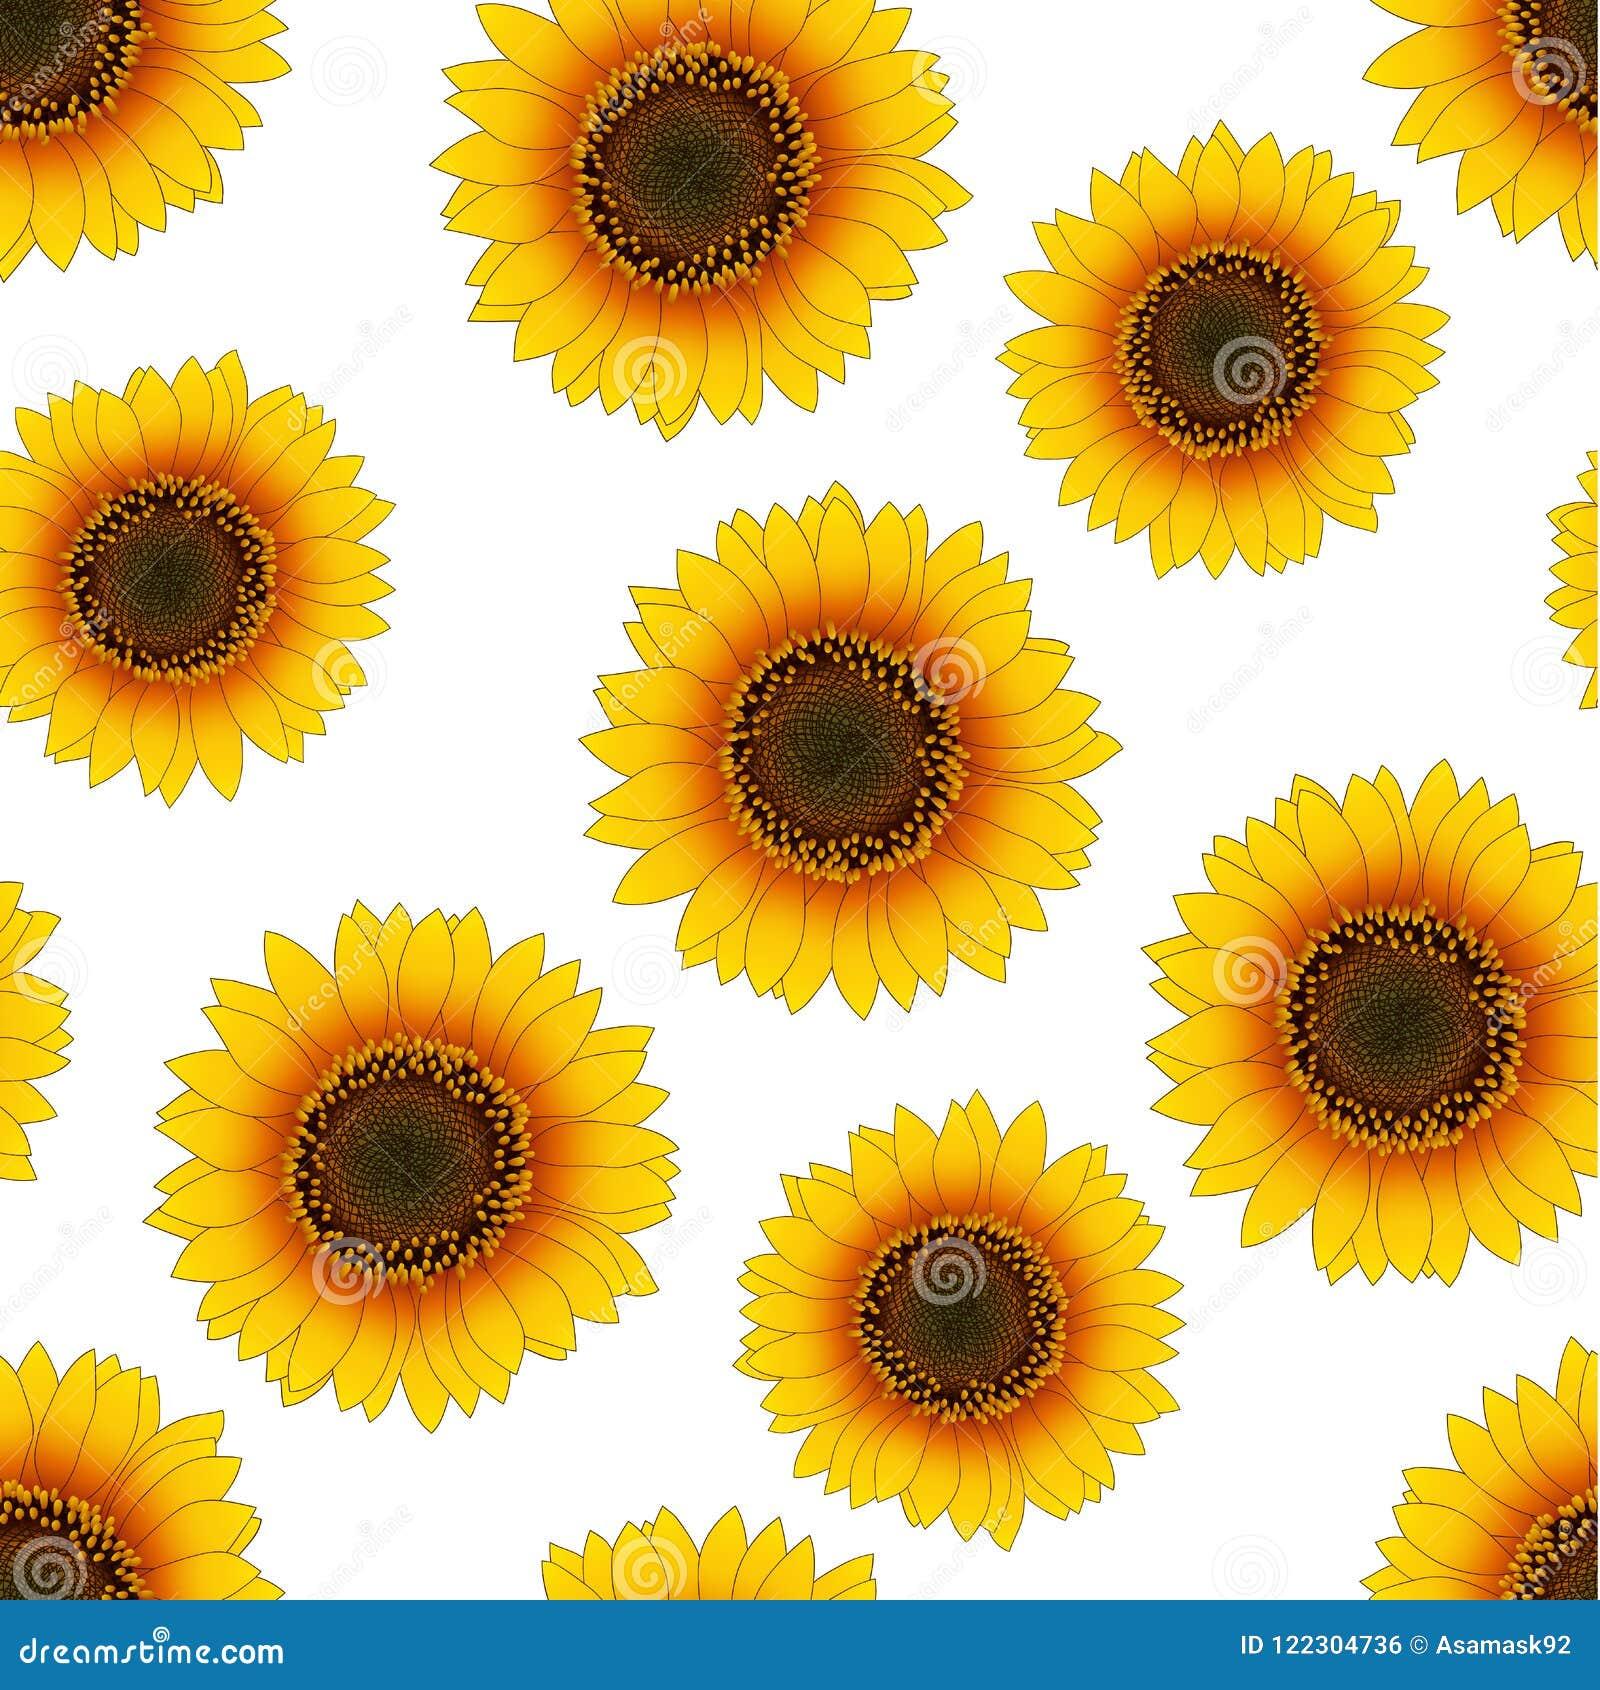 Orange Yellow Sunflower Seamless on White Background. Vector Illustration